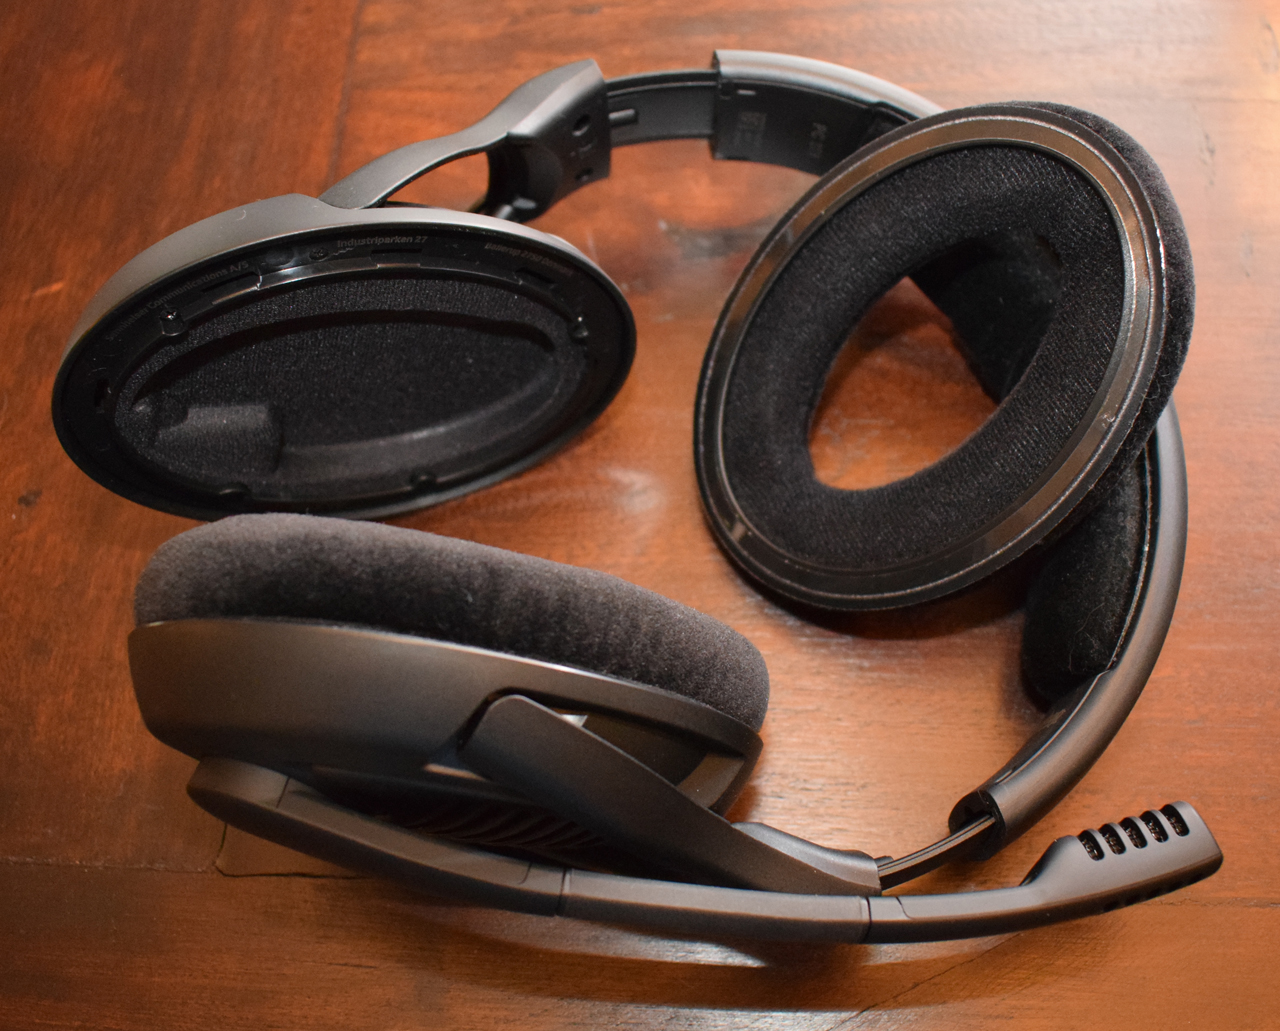 Massdrop x Sennheiser PC37X Gaming Headset Review Removable Ear Pads